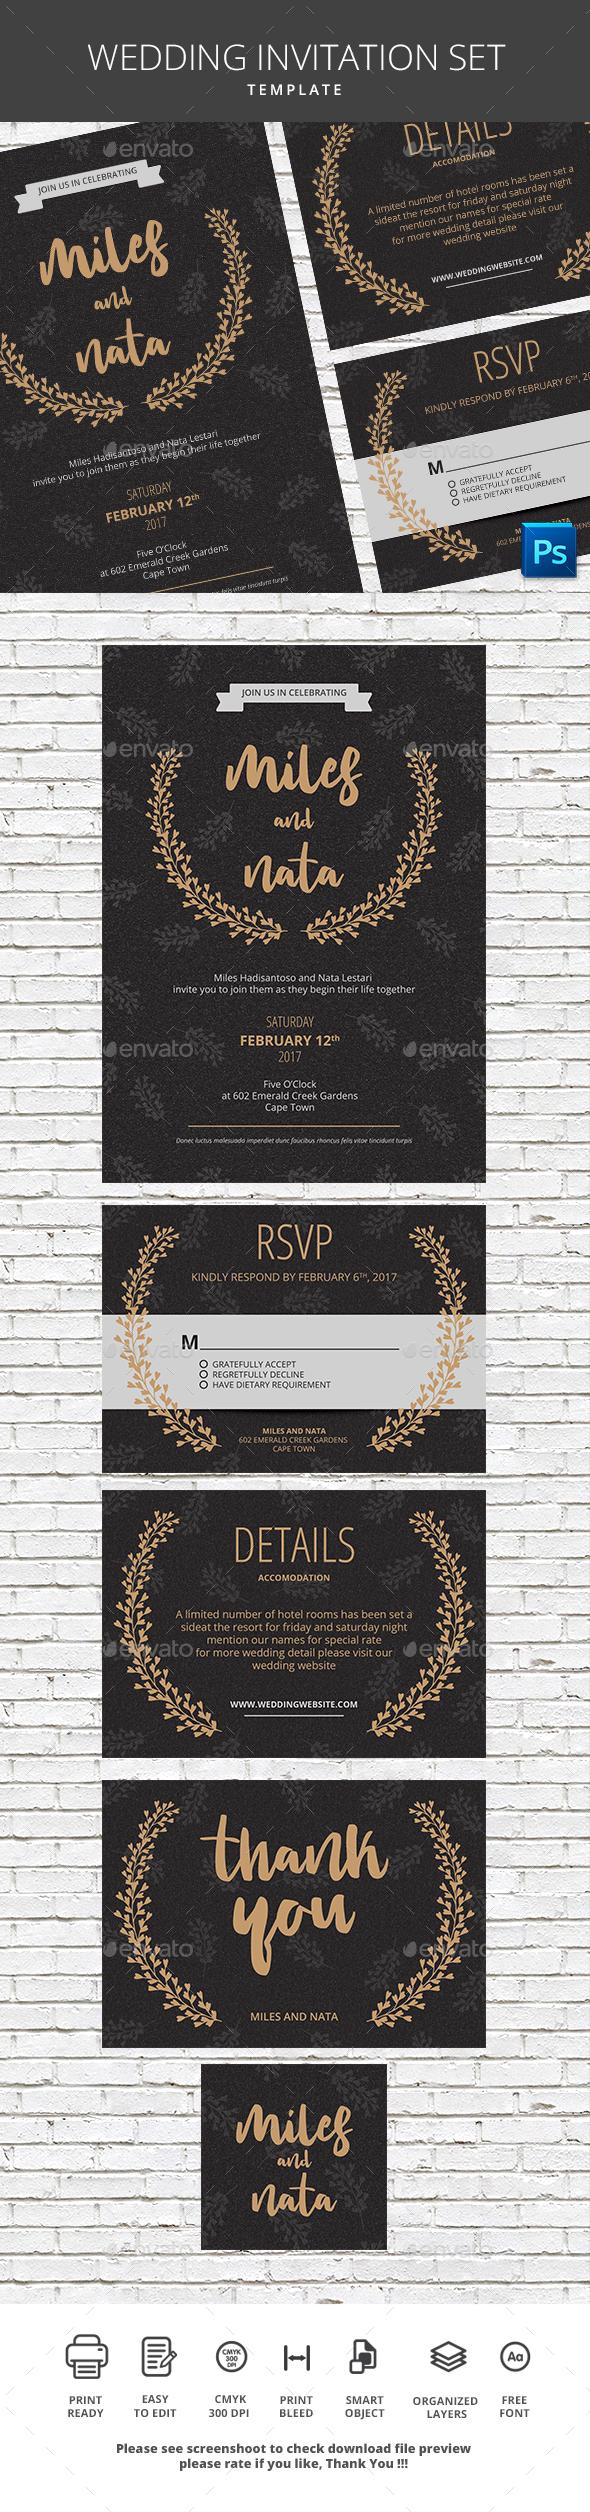 Wedding Invitation | Template